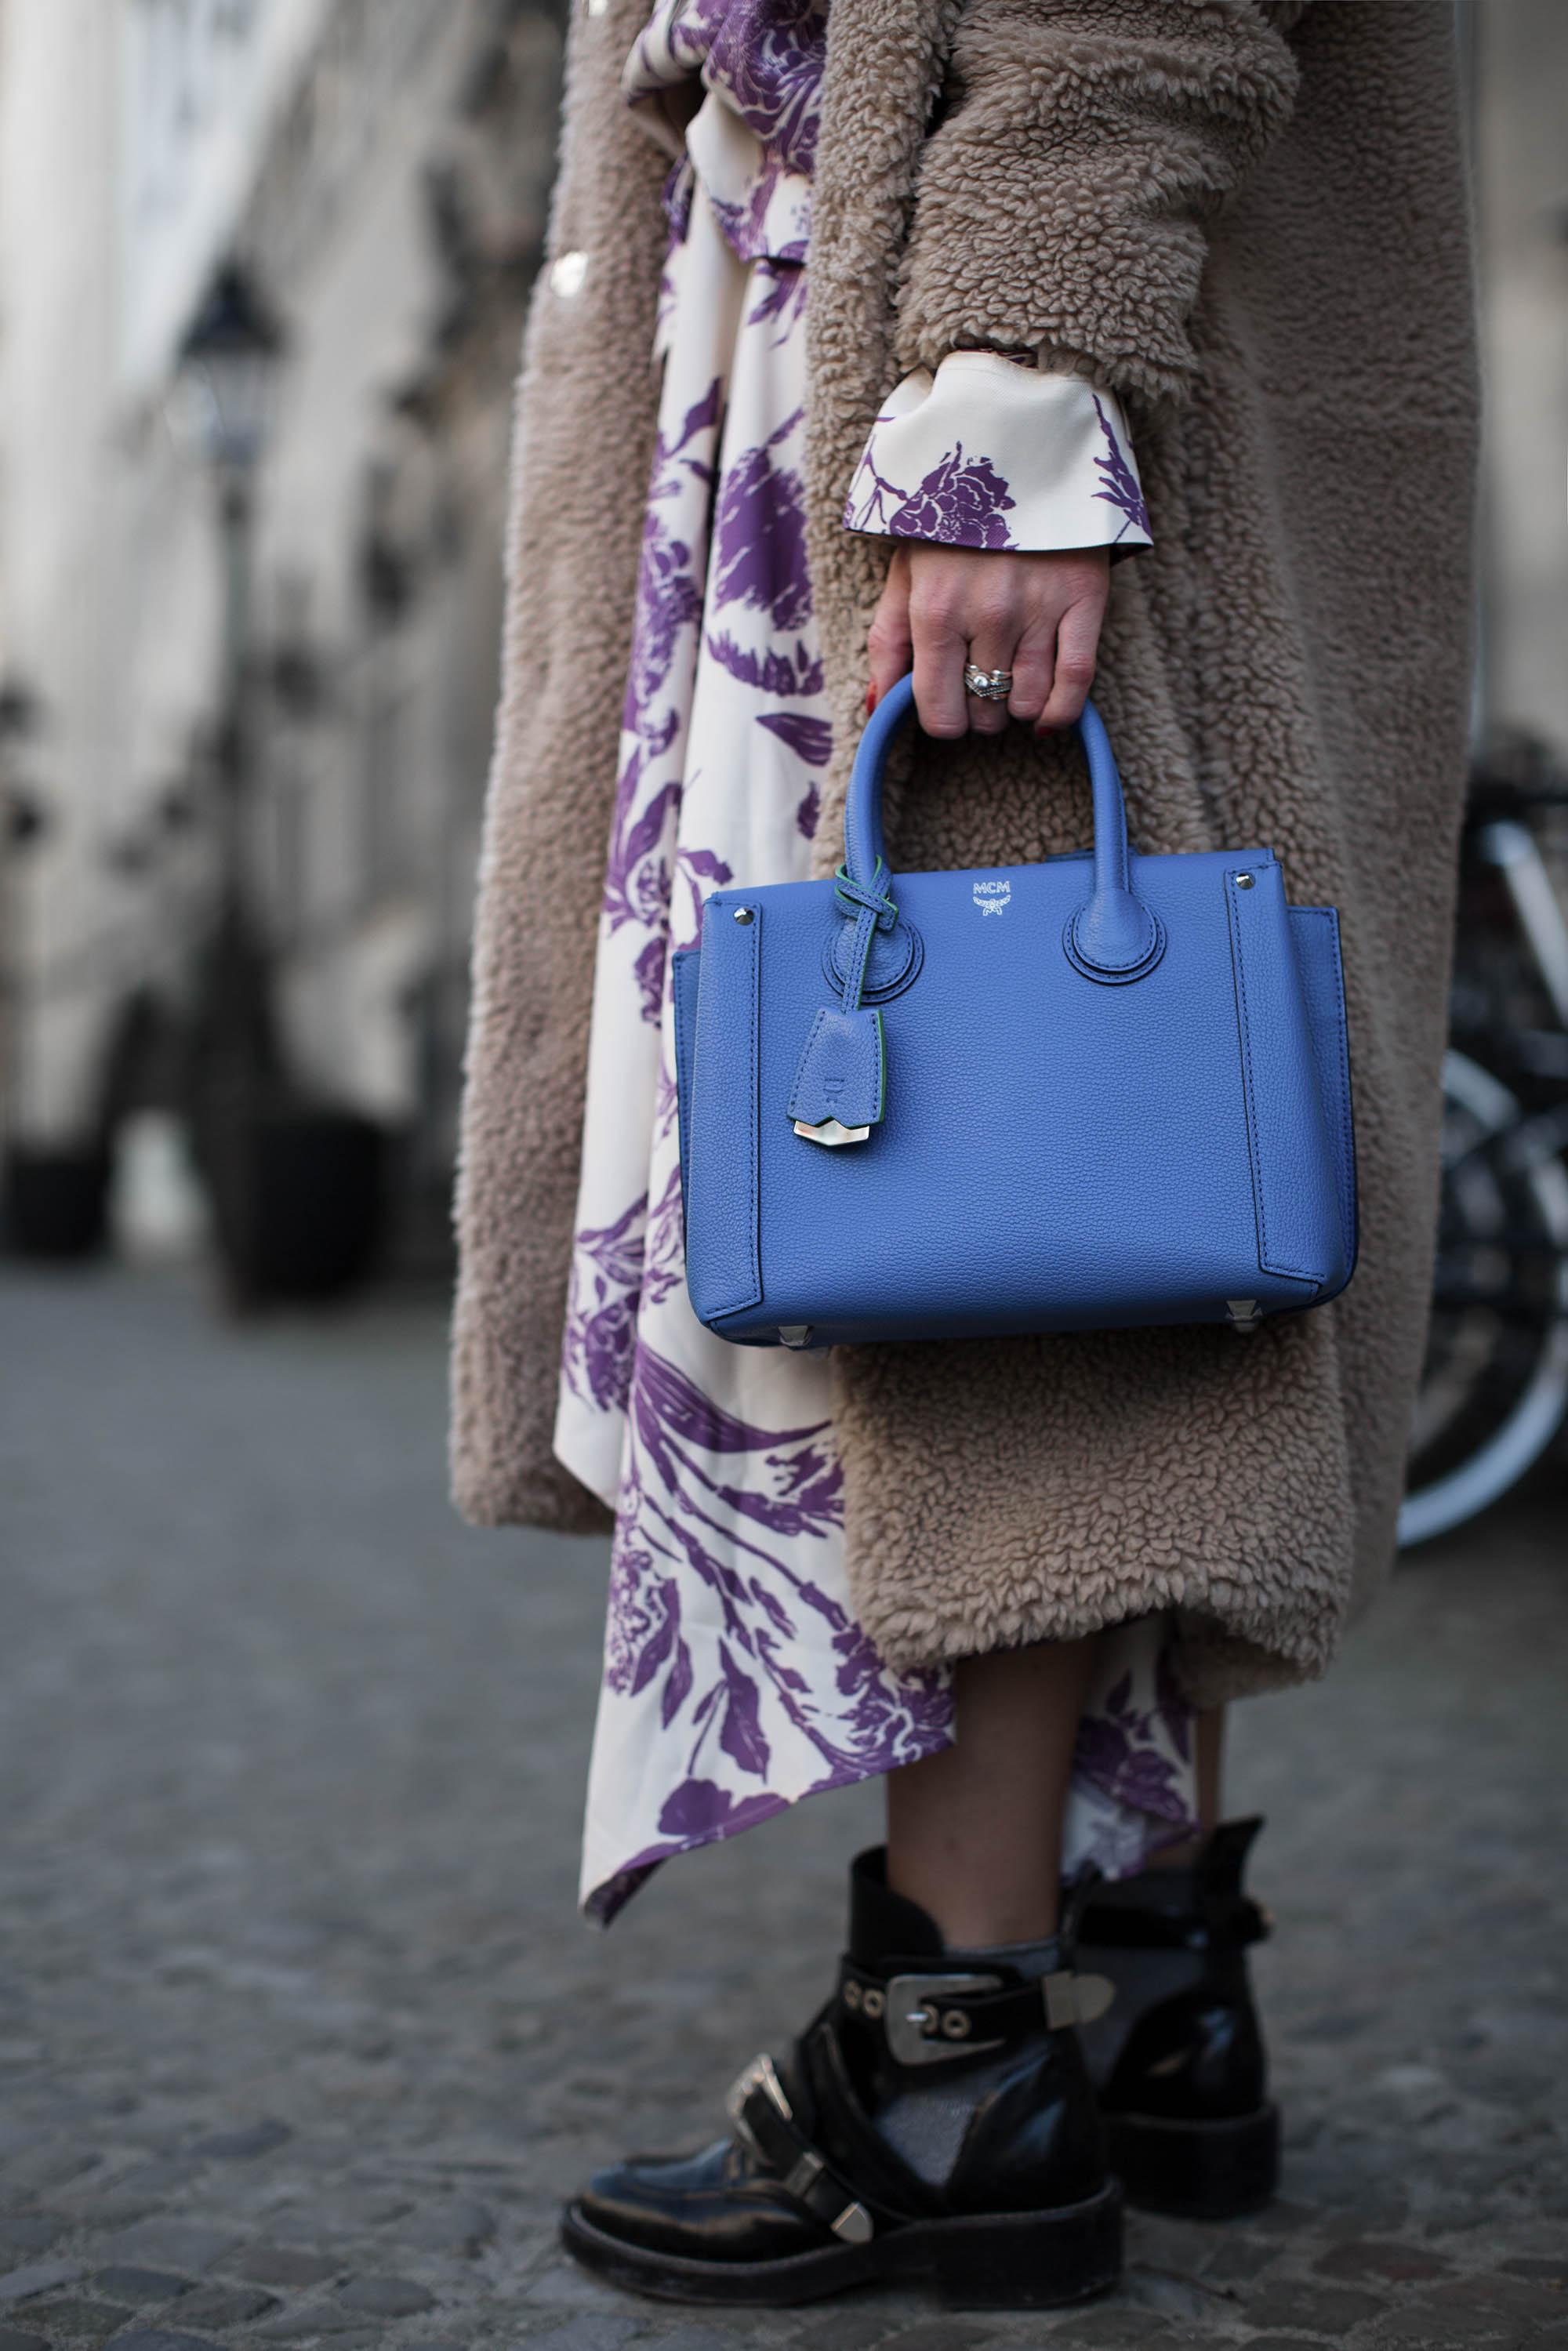 black-palms-streetstyle-hm-mcm-balenciaga-sommerkleid-im-winter-fashionblog-fashionweek-berlin-10